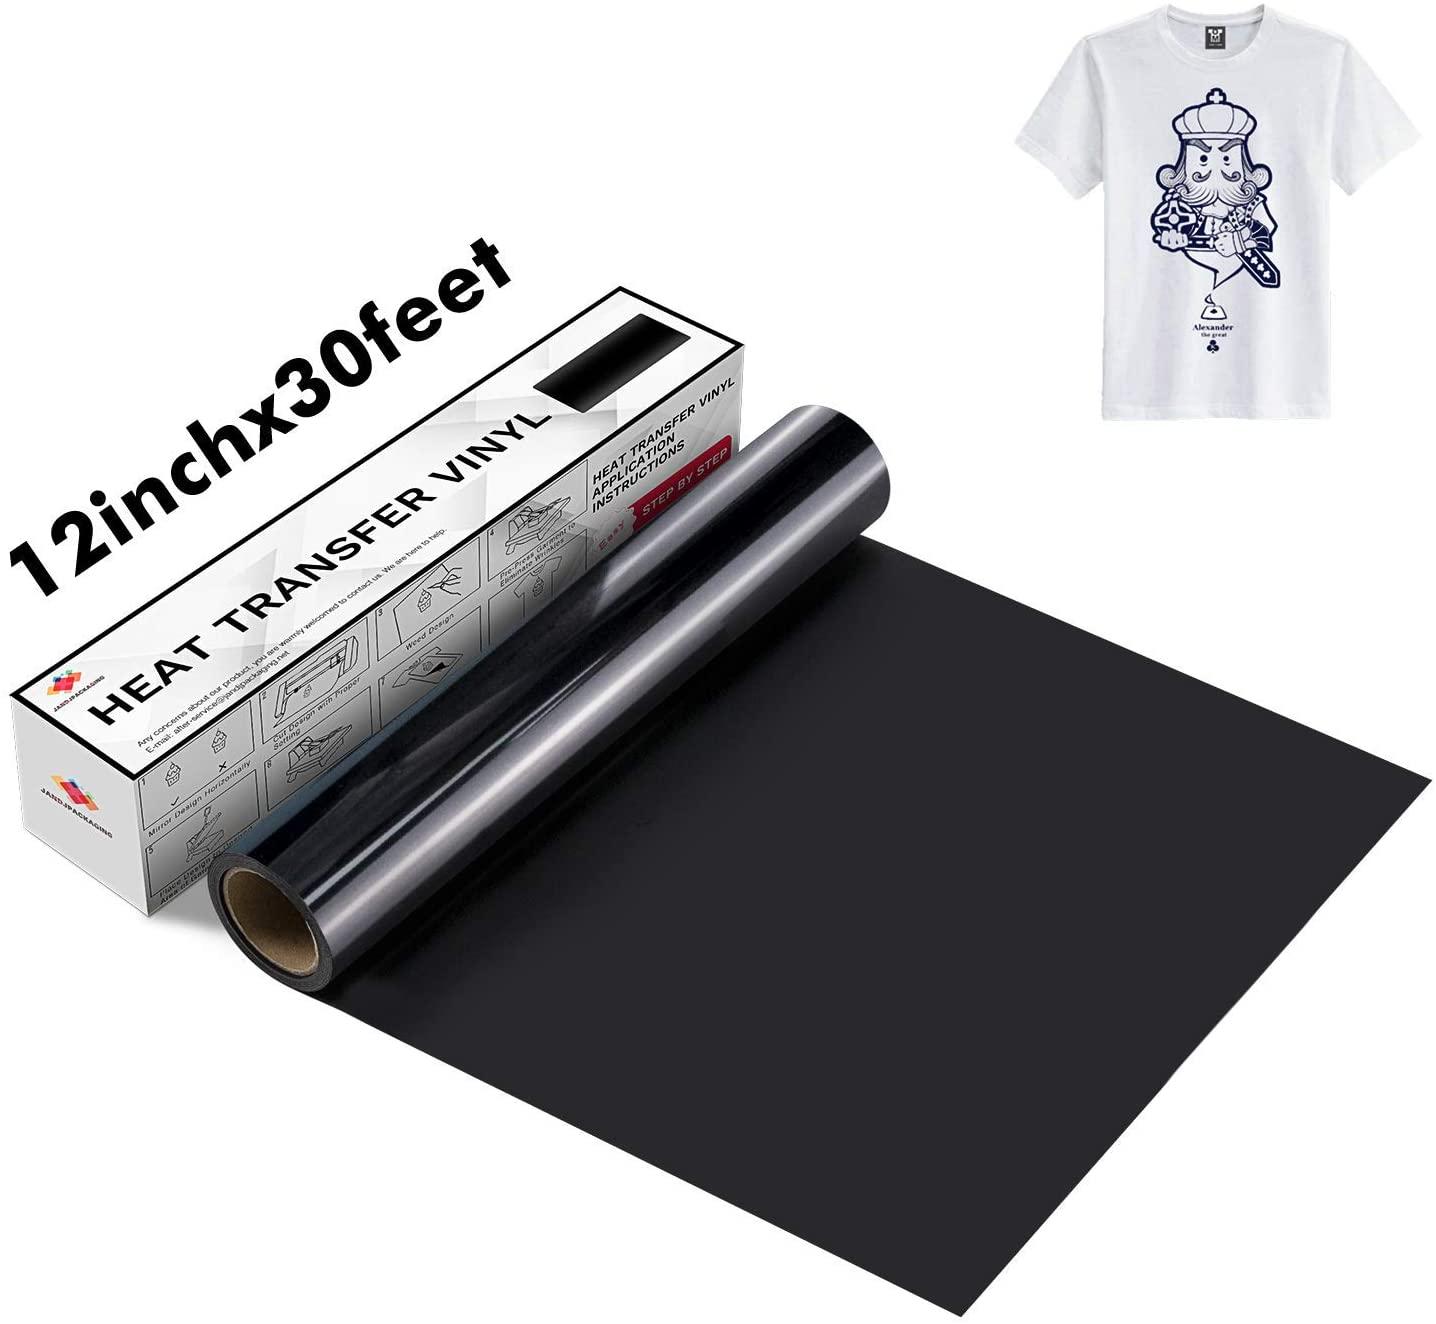 JANDJPACKAGING Black Heat Transfer Vinyl Roll - Black HTV Vinyl Roll 12 x 30FT Iron on Vinyl for Cricut and Silhouette